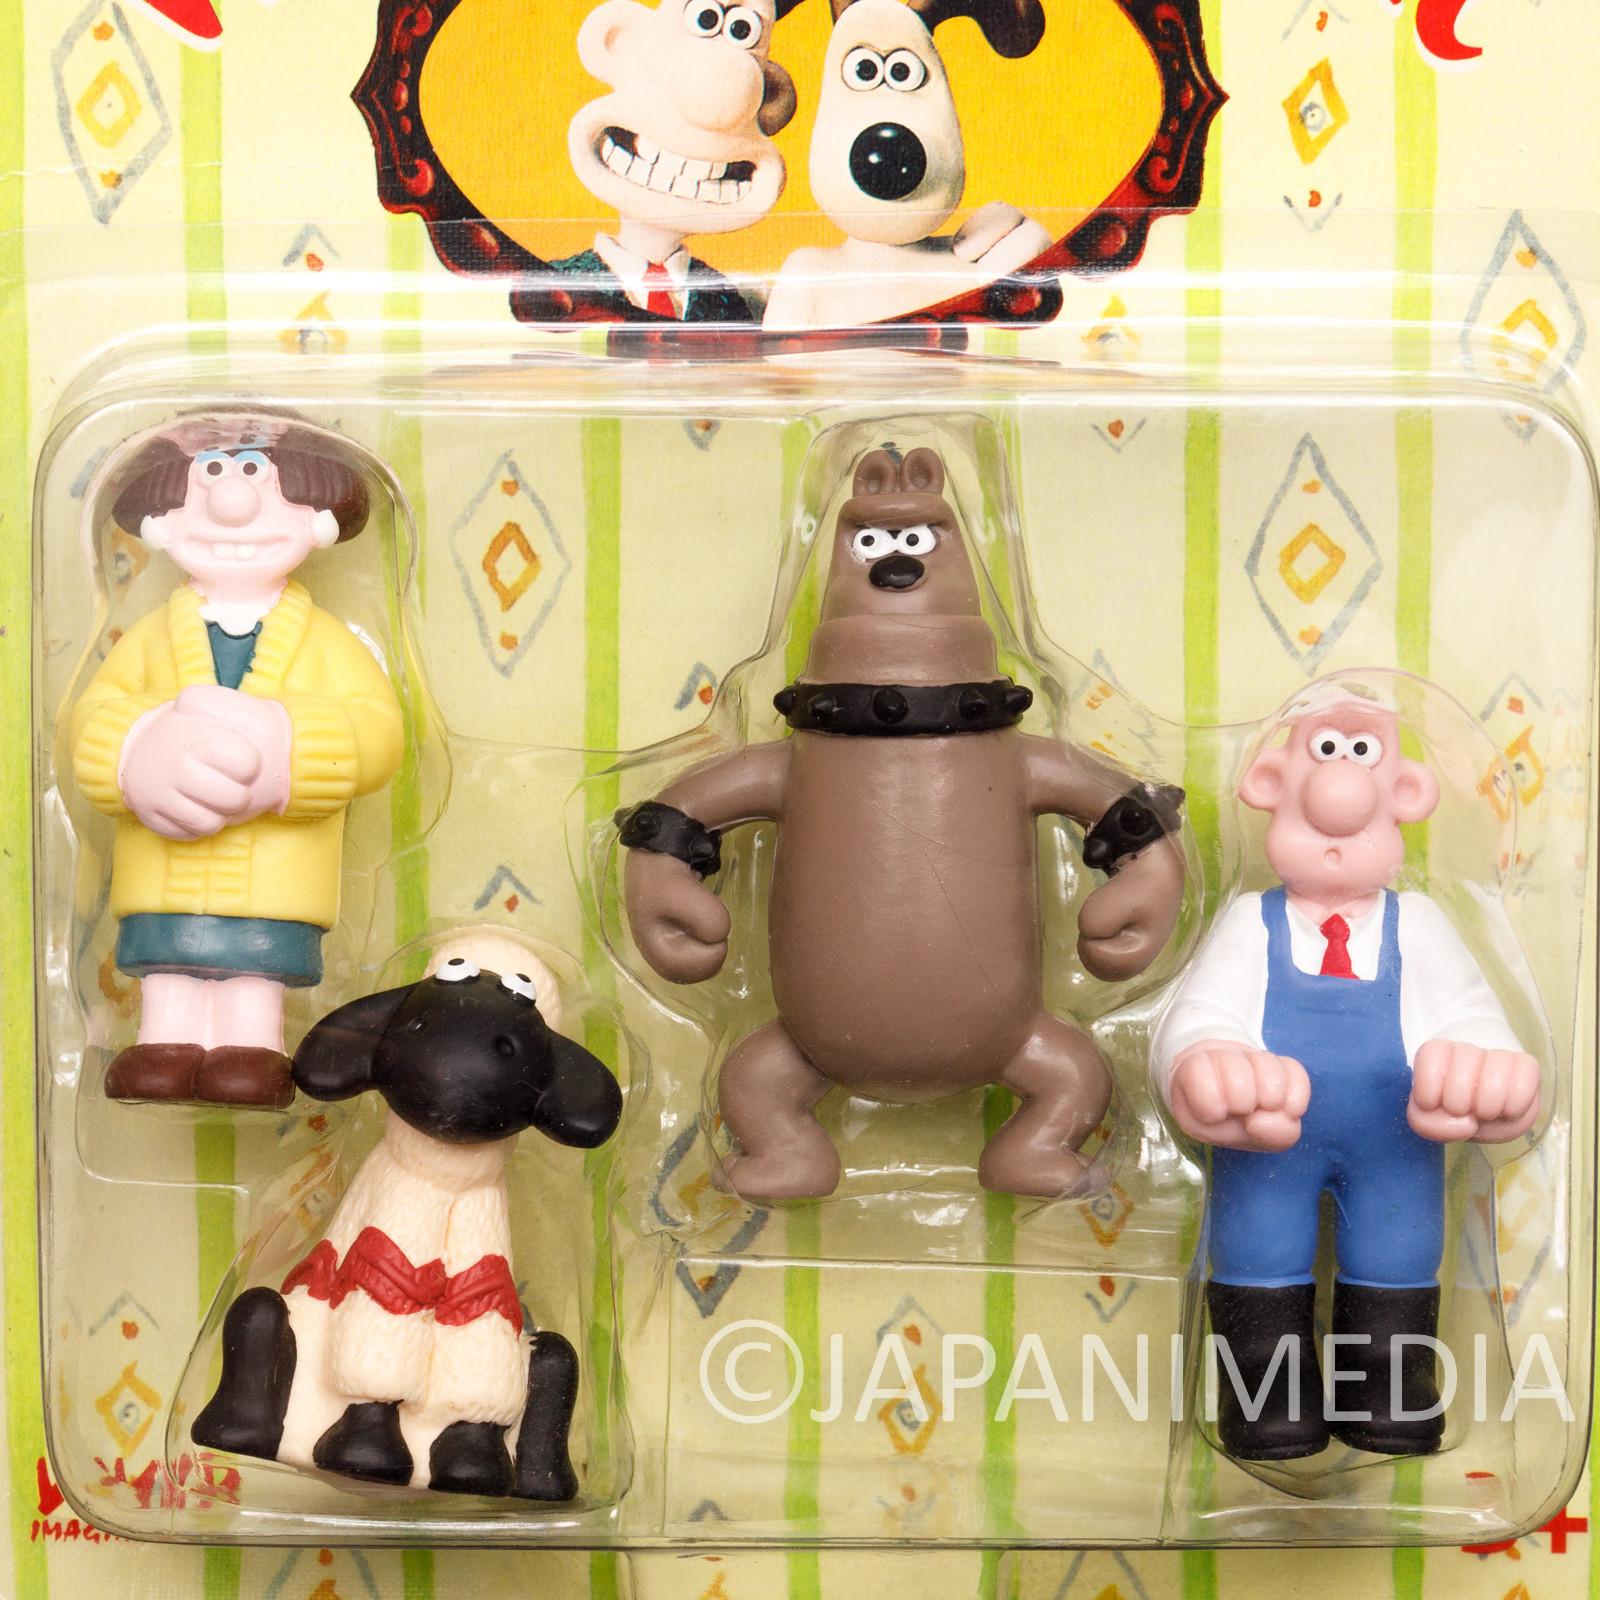 Wallace & Gromit Mini Figure Pack Vivid Imaginations Ardman JAPAN